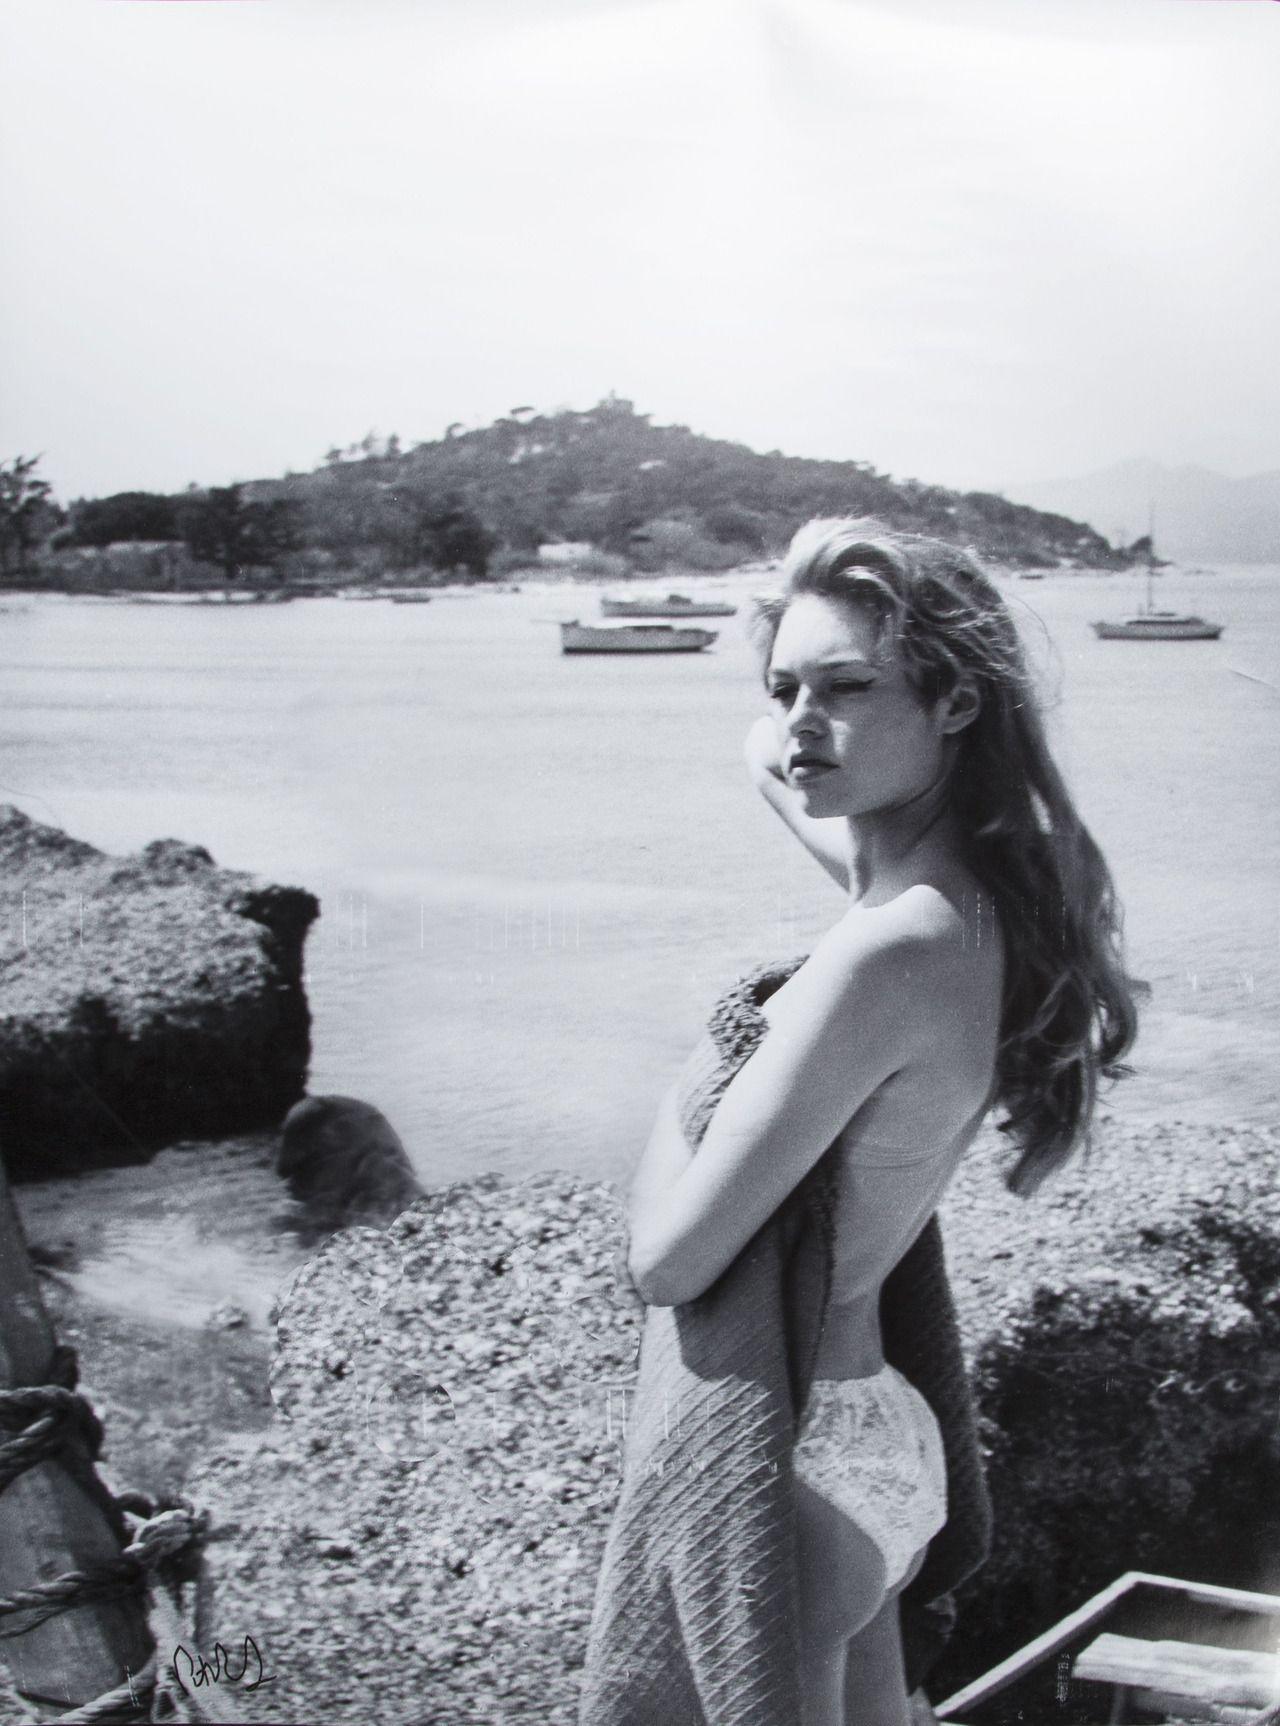 My Secret Beach Hipsoulover Brigitte Bardot Saint Tropez Brigitte Bardot Bridget Bardot Bridgette Bardot